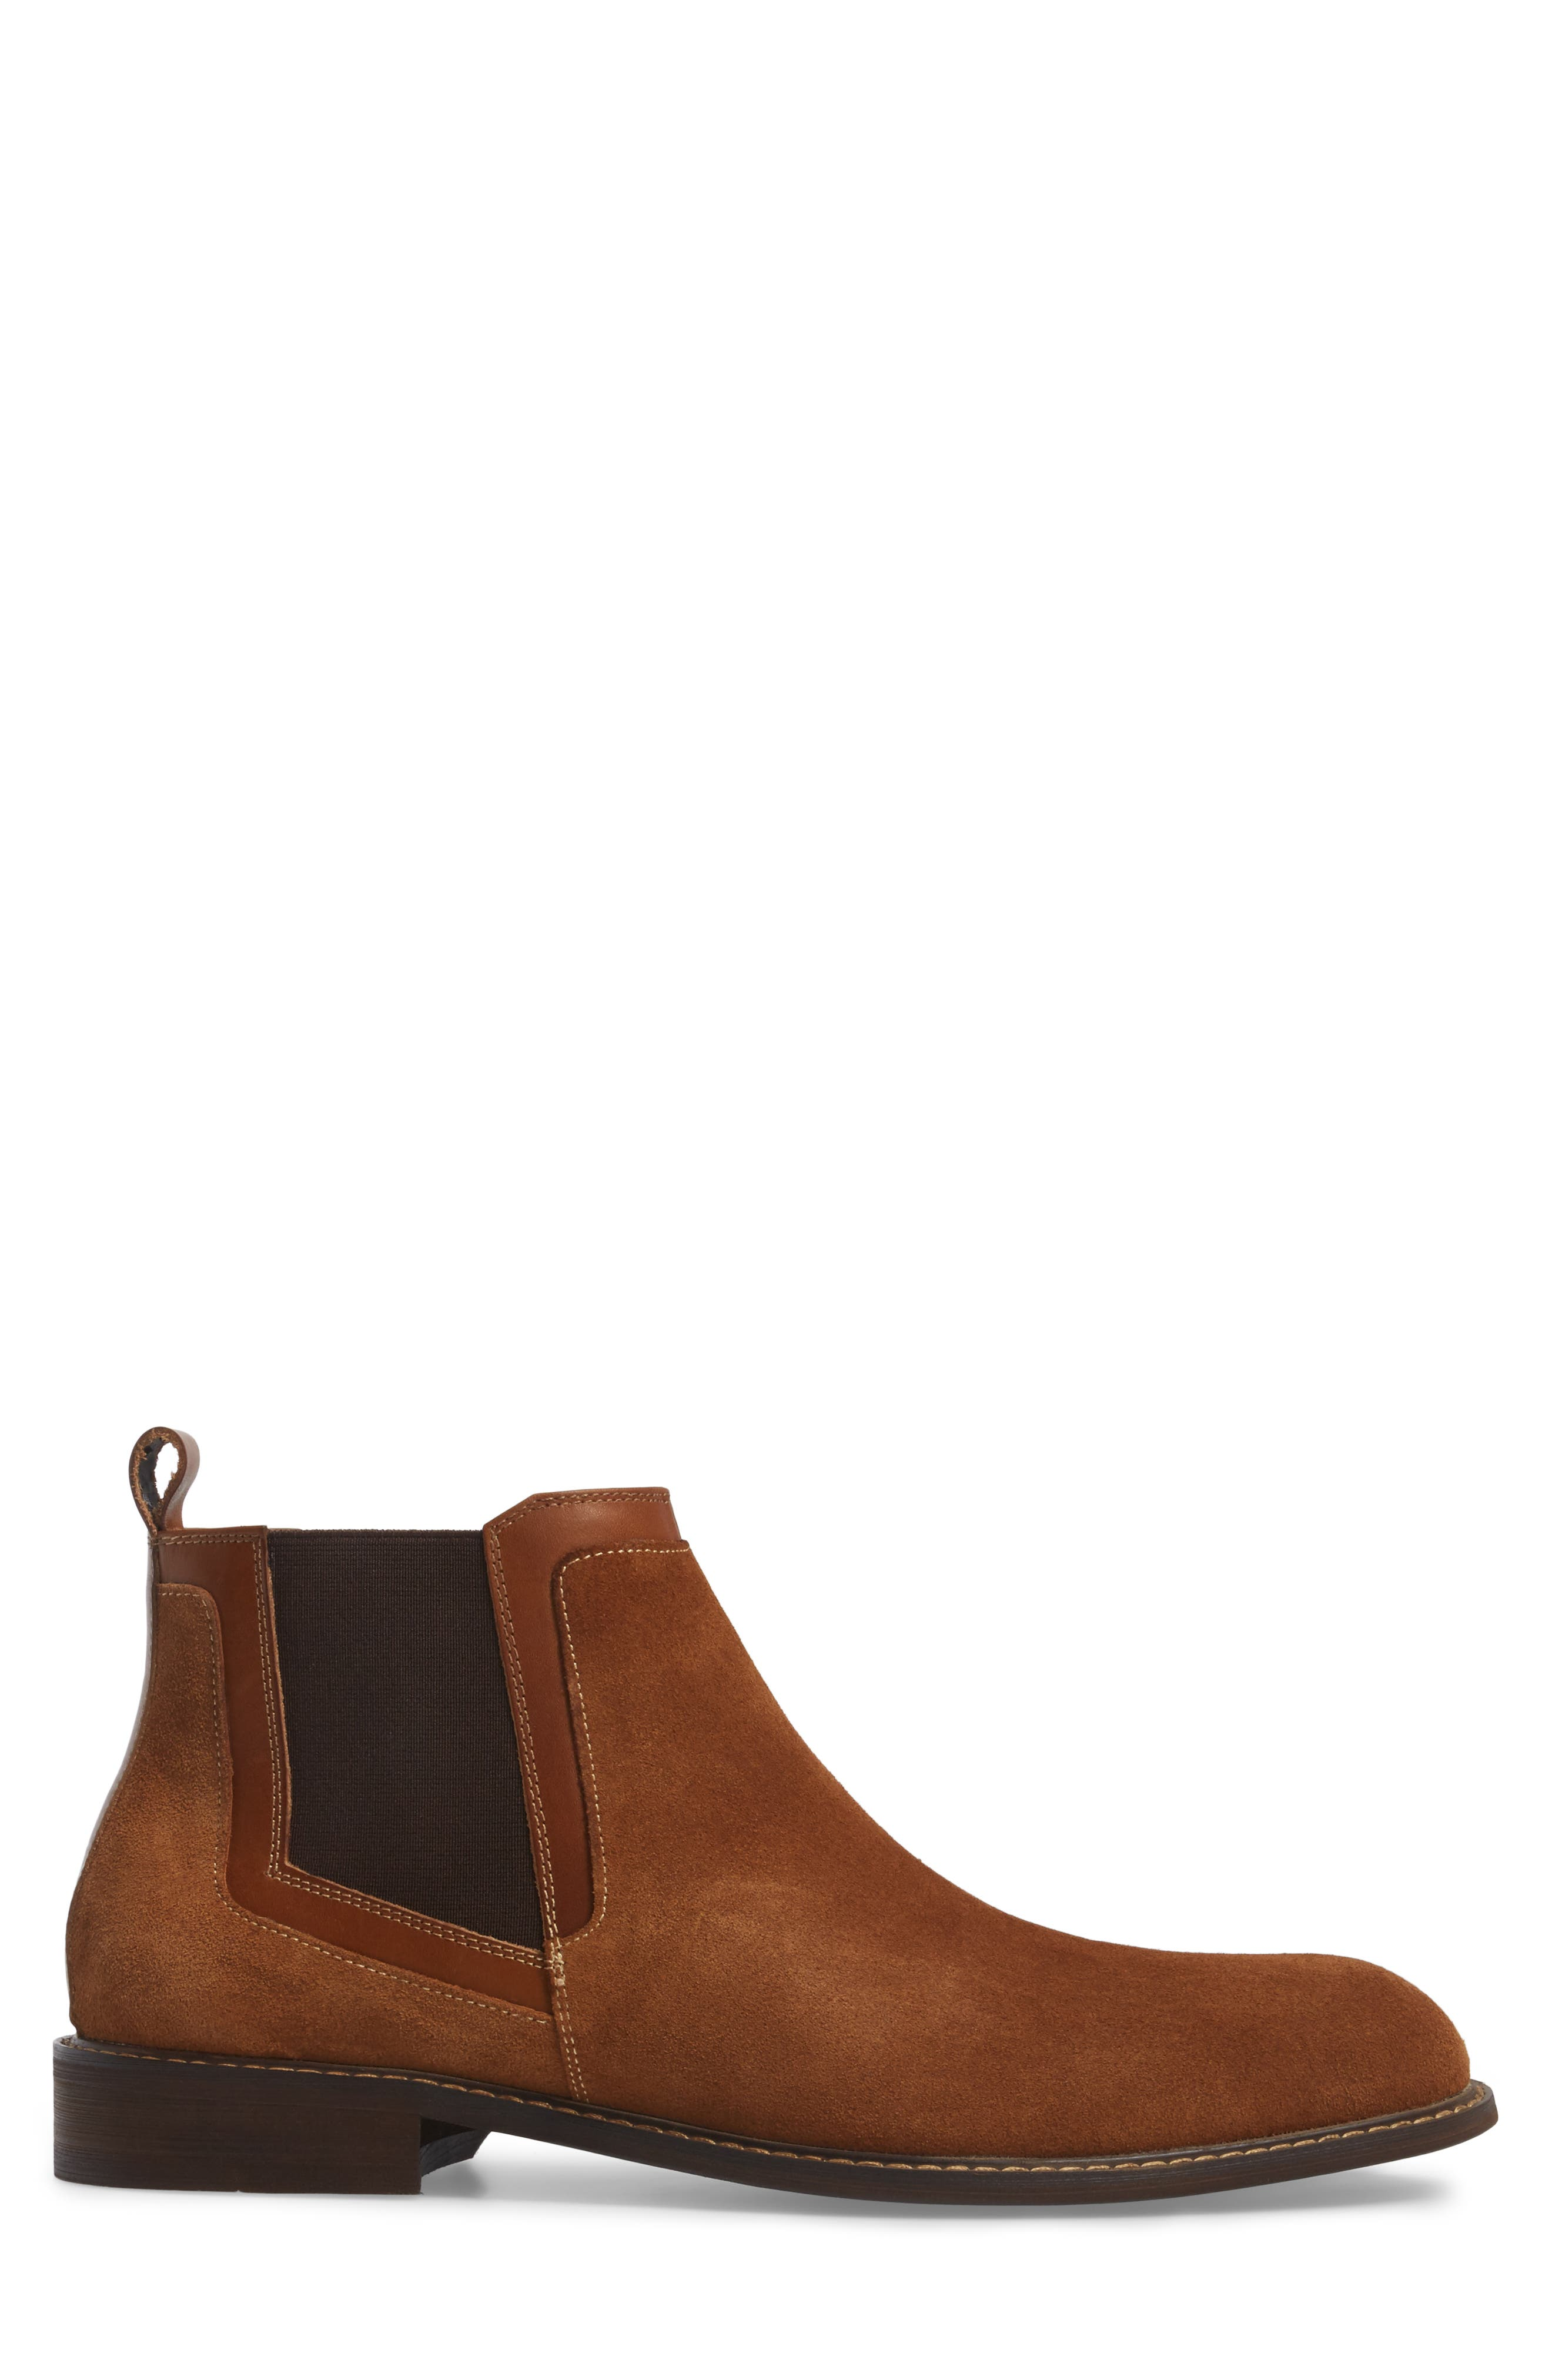 Alternate Image 3  - Kenneth Cole New York Chlesea Boot (Men)